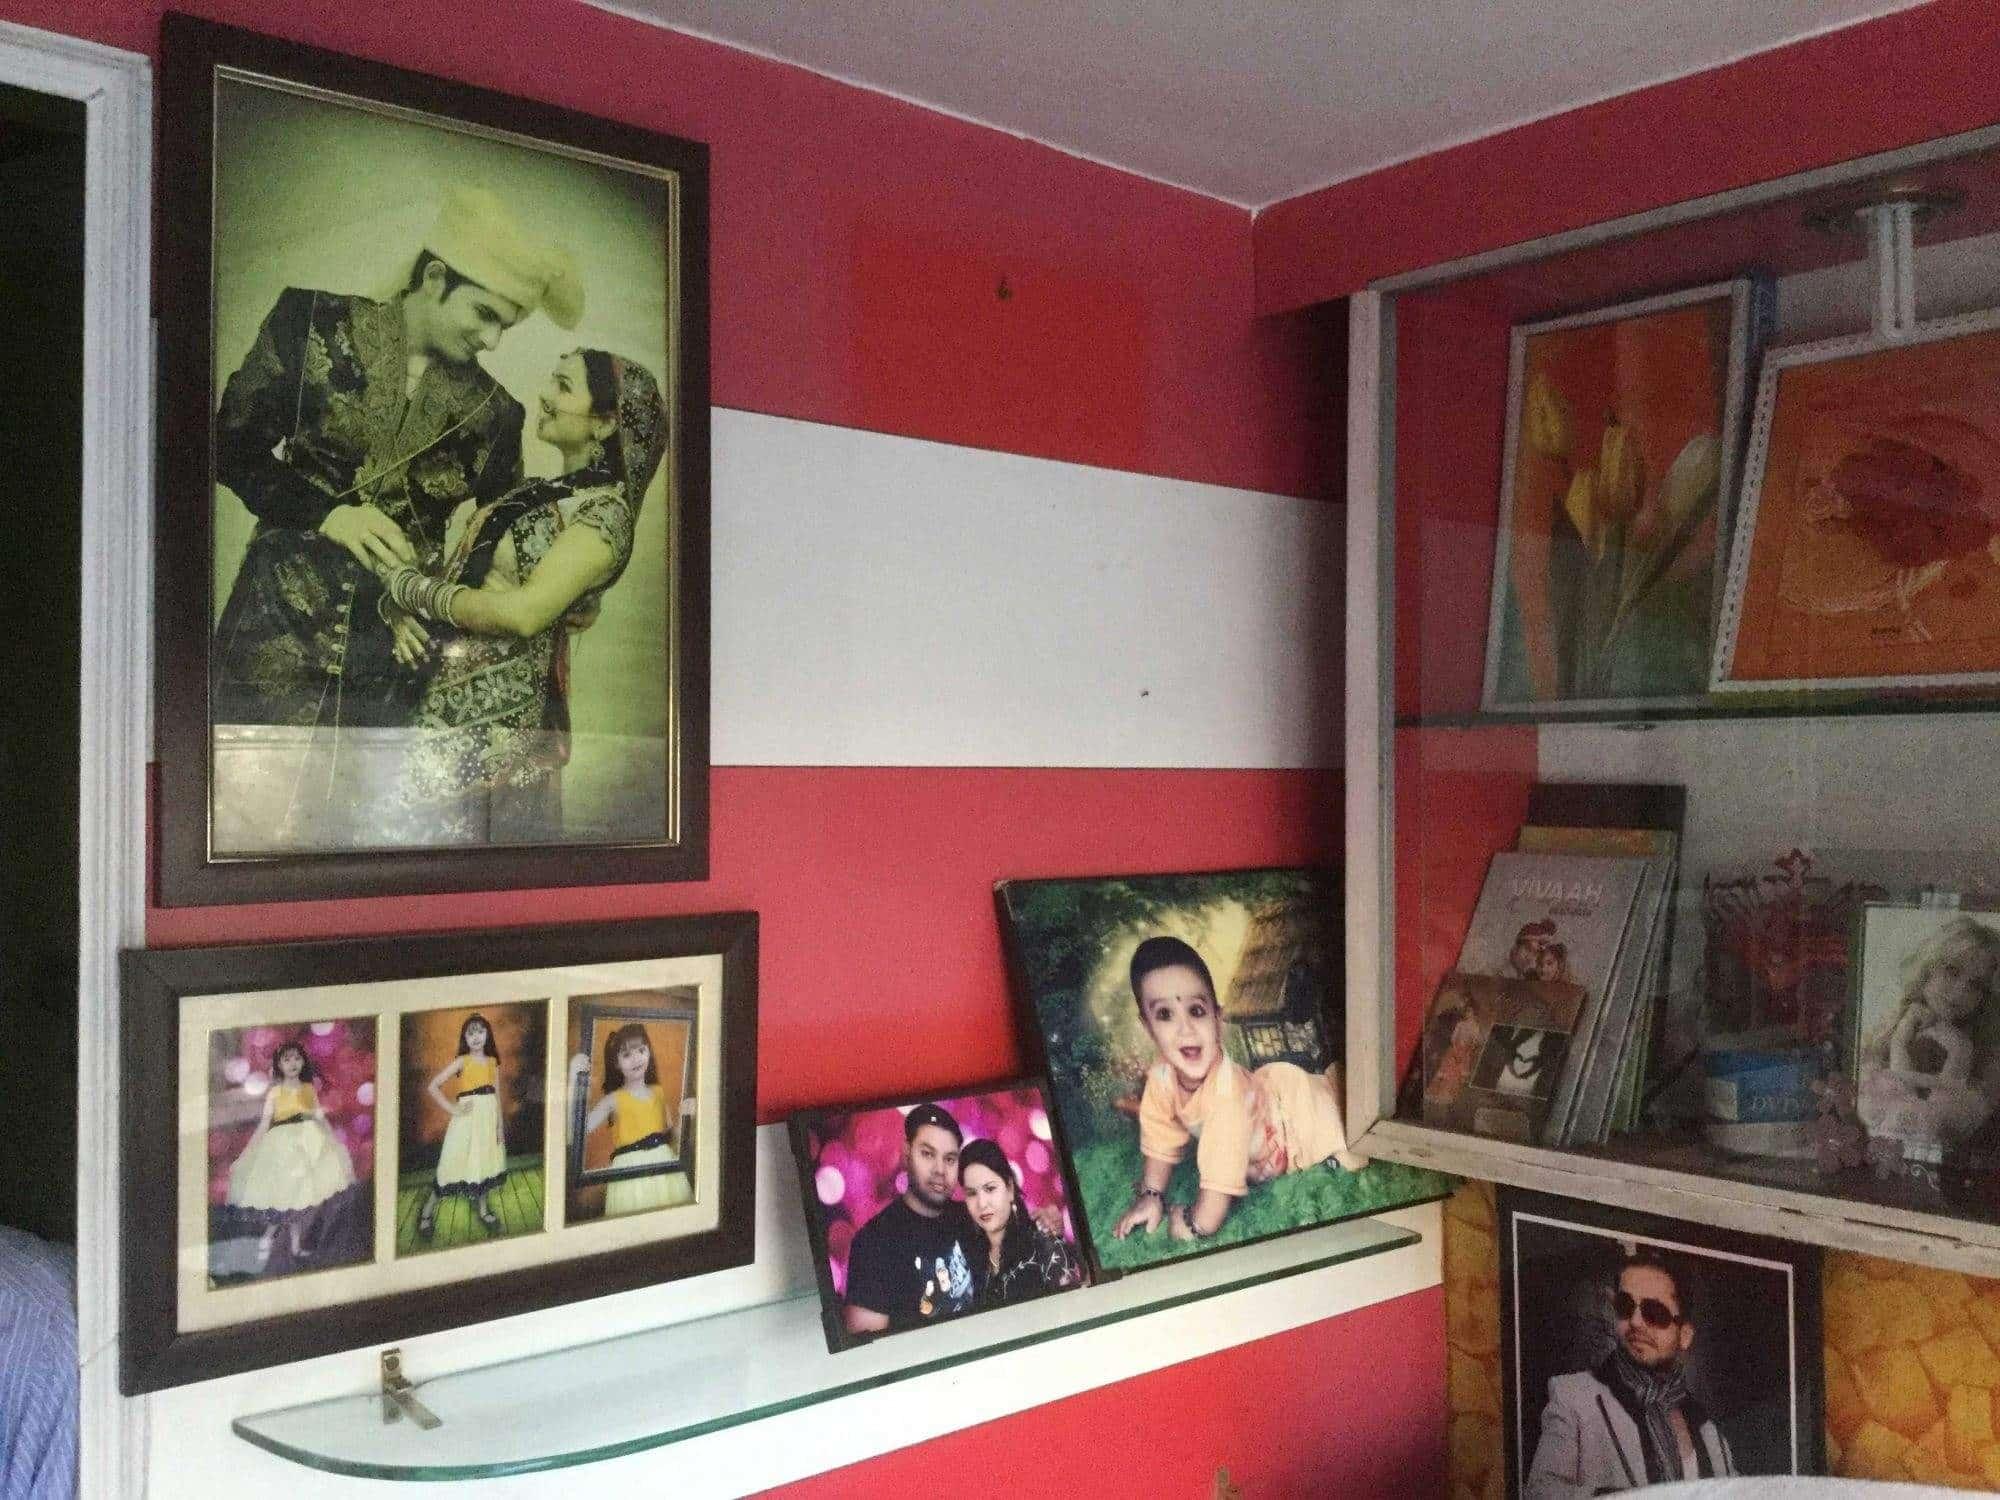 New Lucky Photo Studio Photos, Vaishali Nagar, Nagpur  Photo